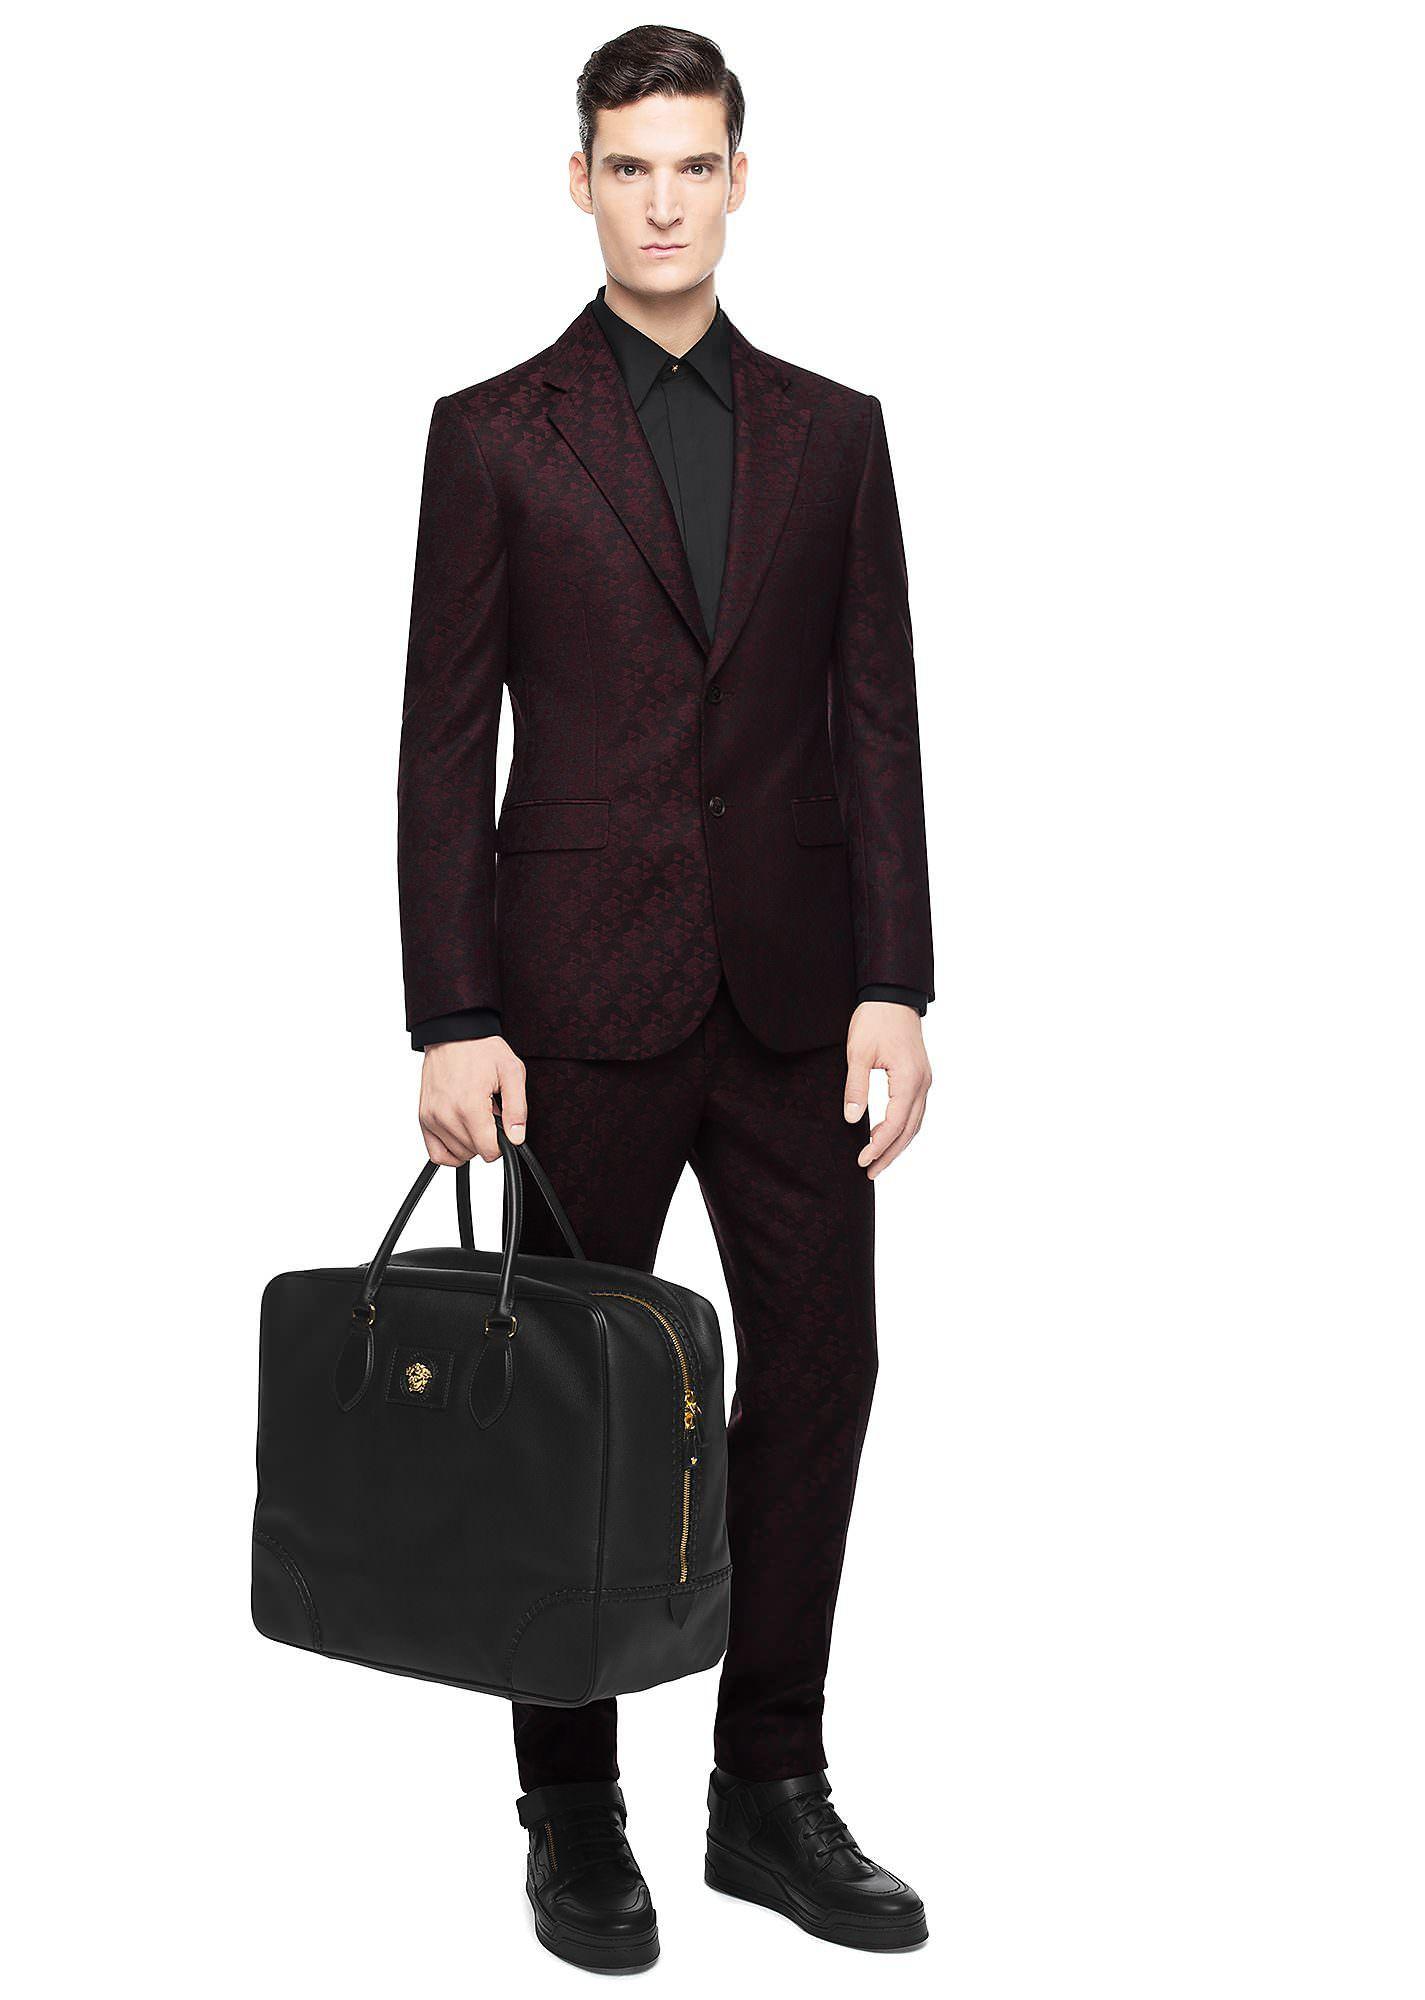 Versace Diamond Patterned Jaquard Suit | Luxury mens ...